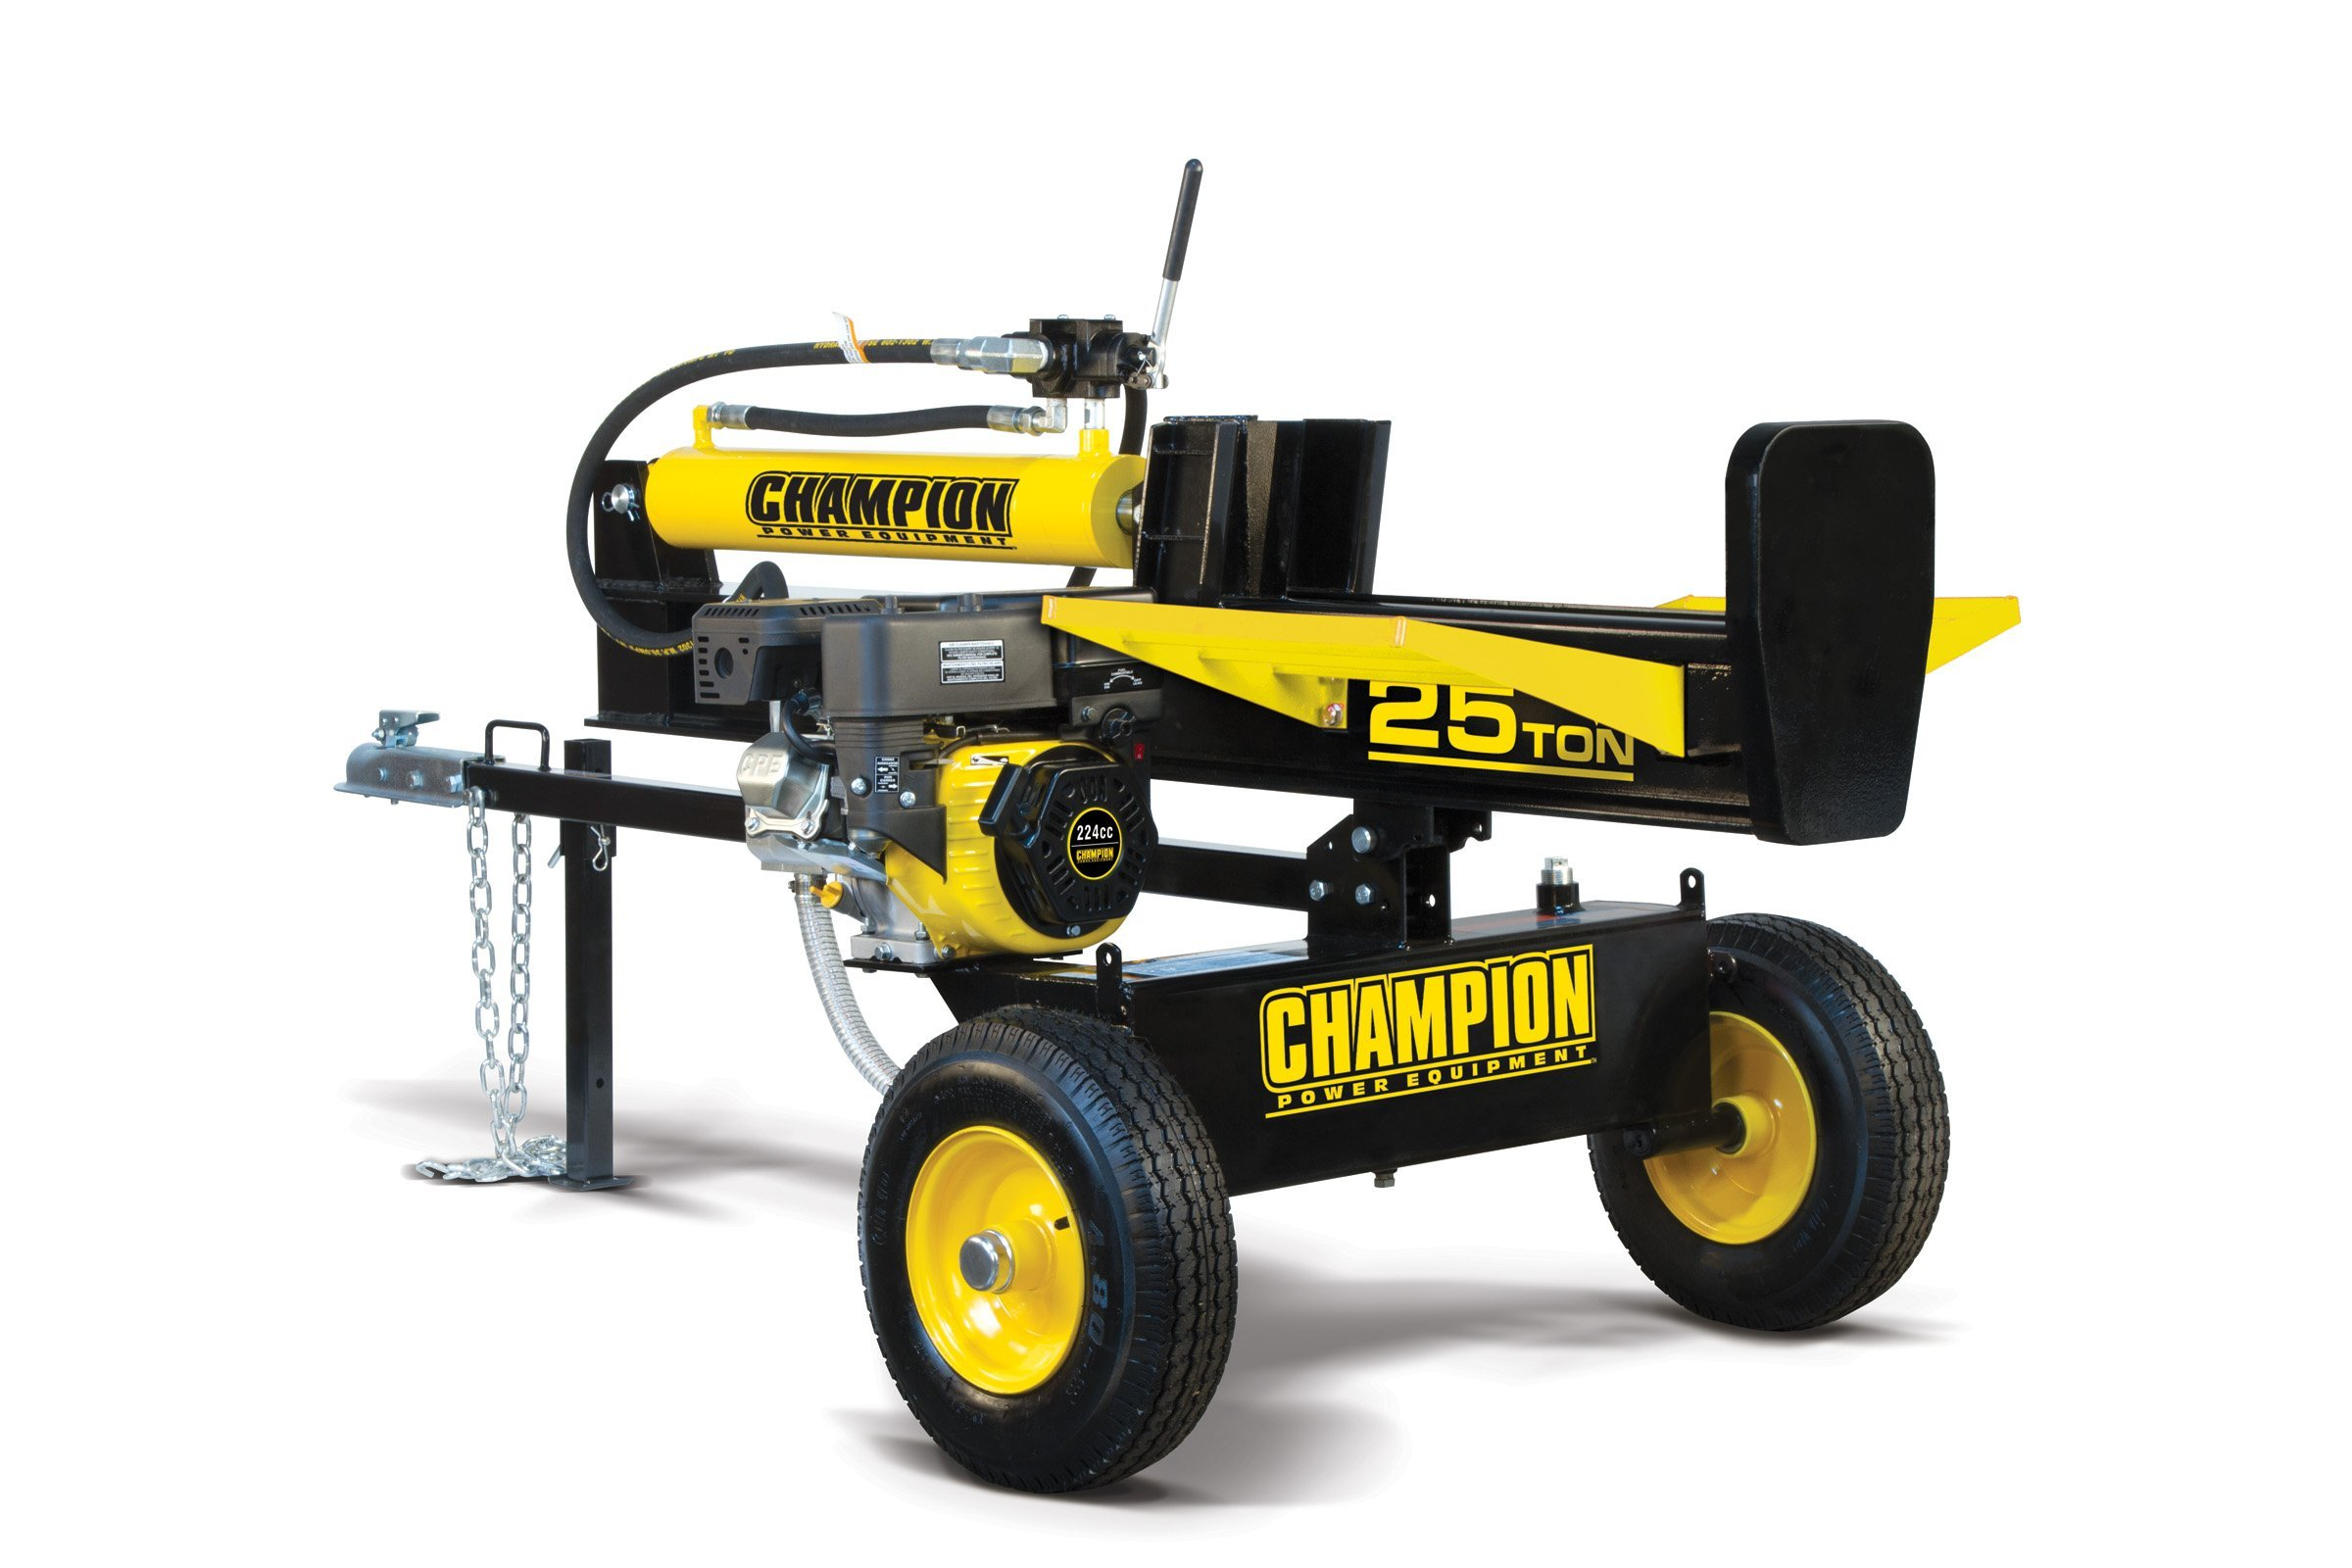 Champion 25-Ton Horizontal/Vertical Full Beam Gas Log Splitter with Auto Return by Champion Power Equipment